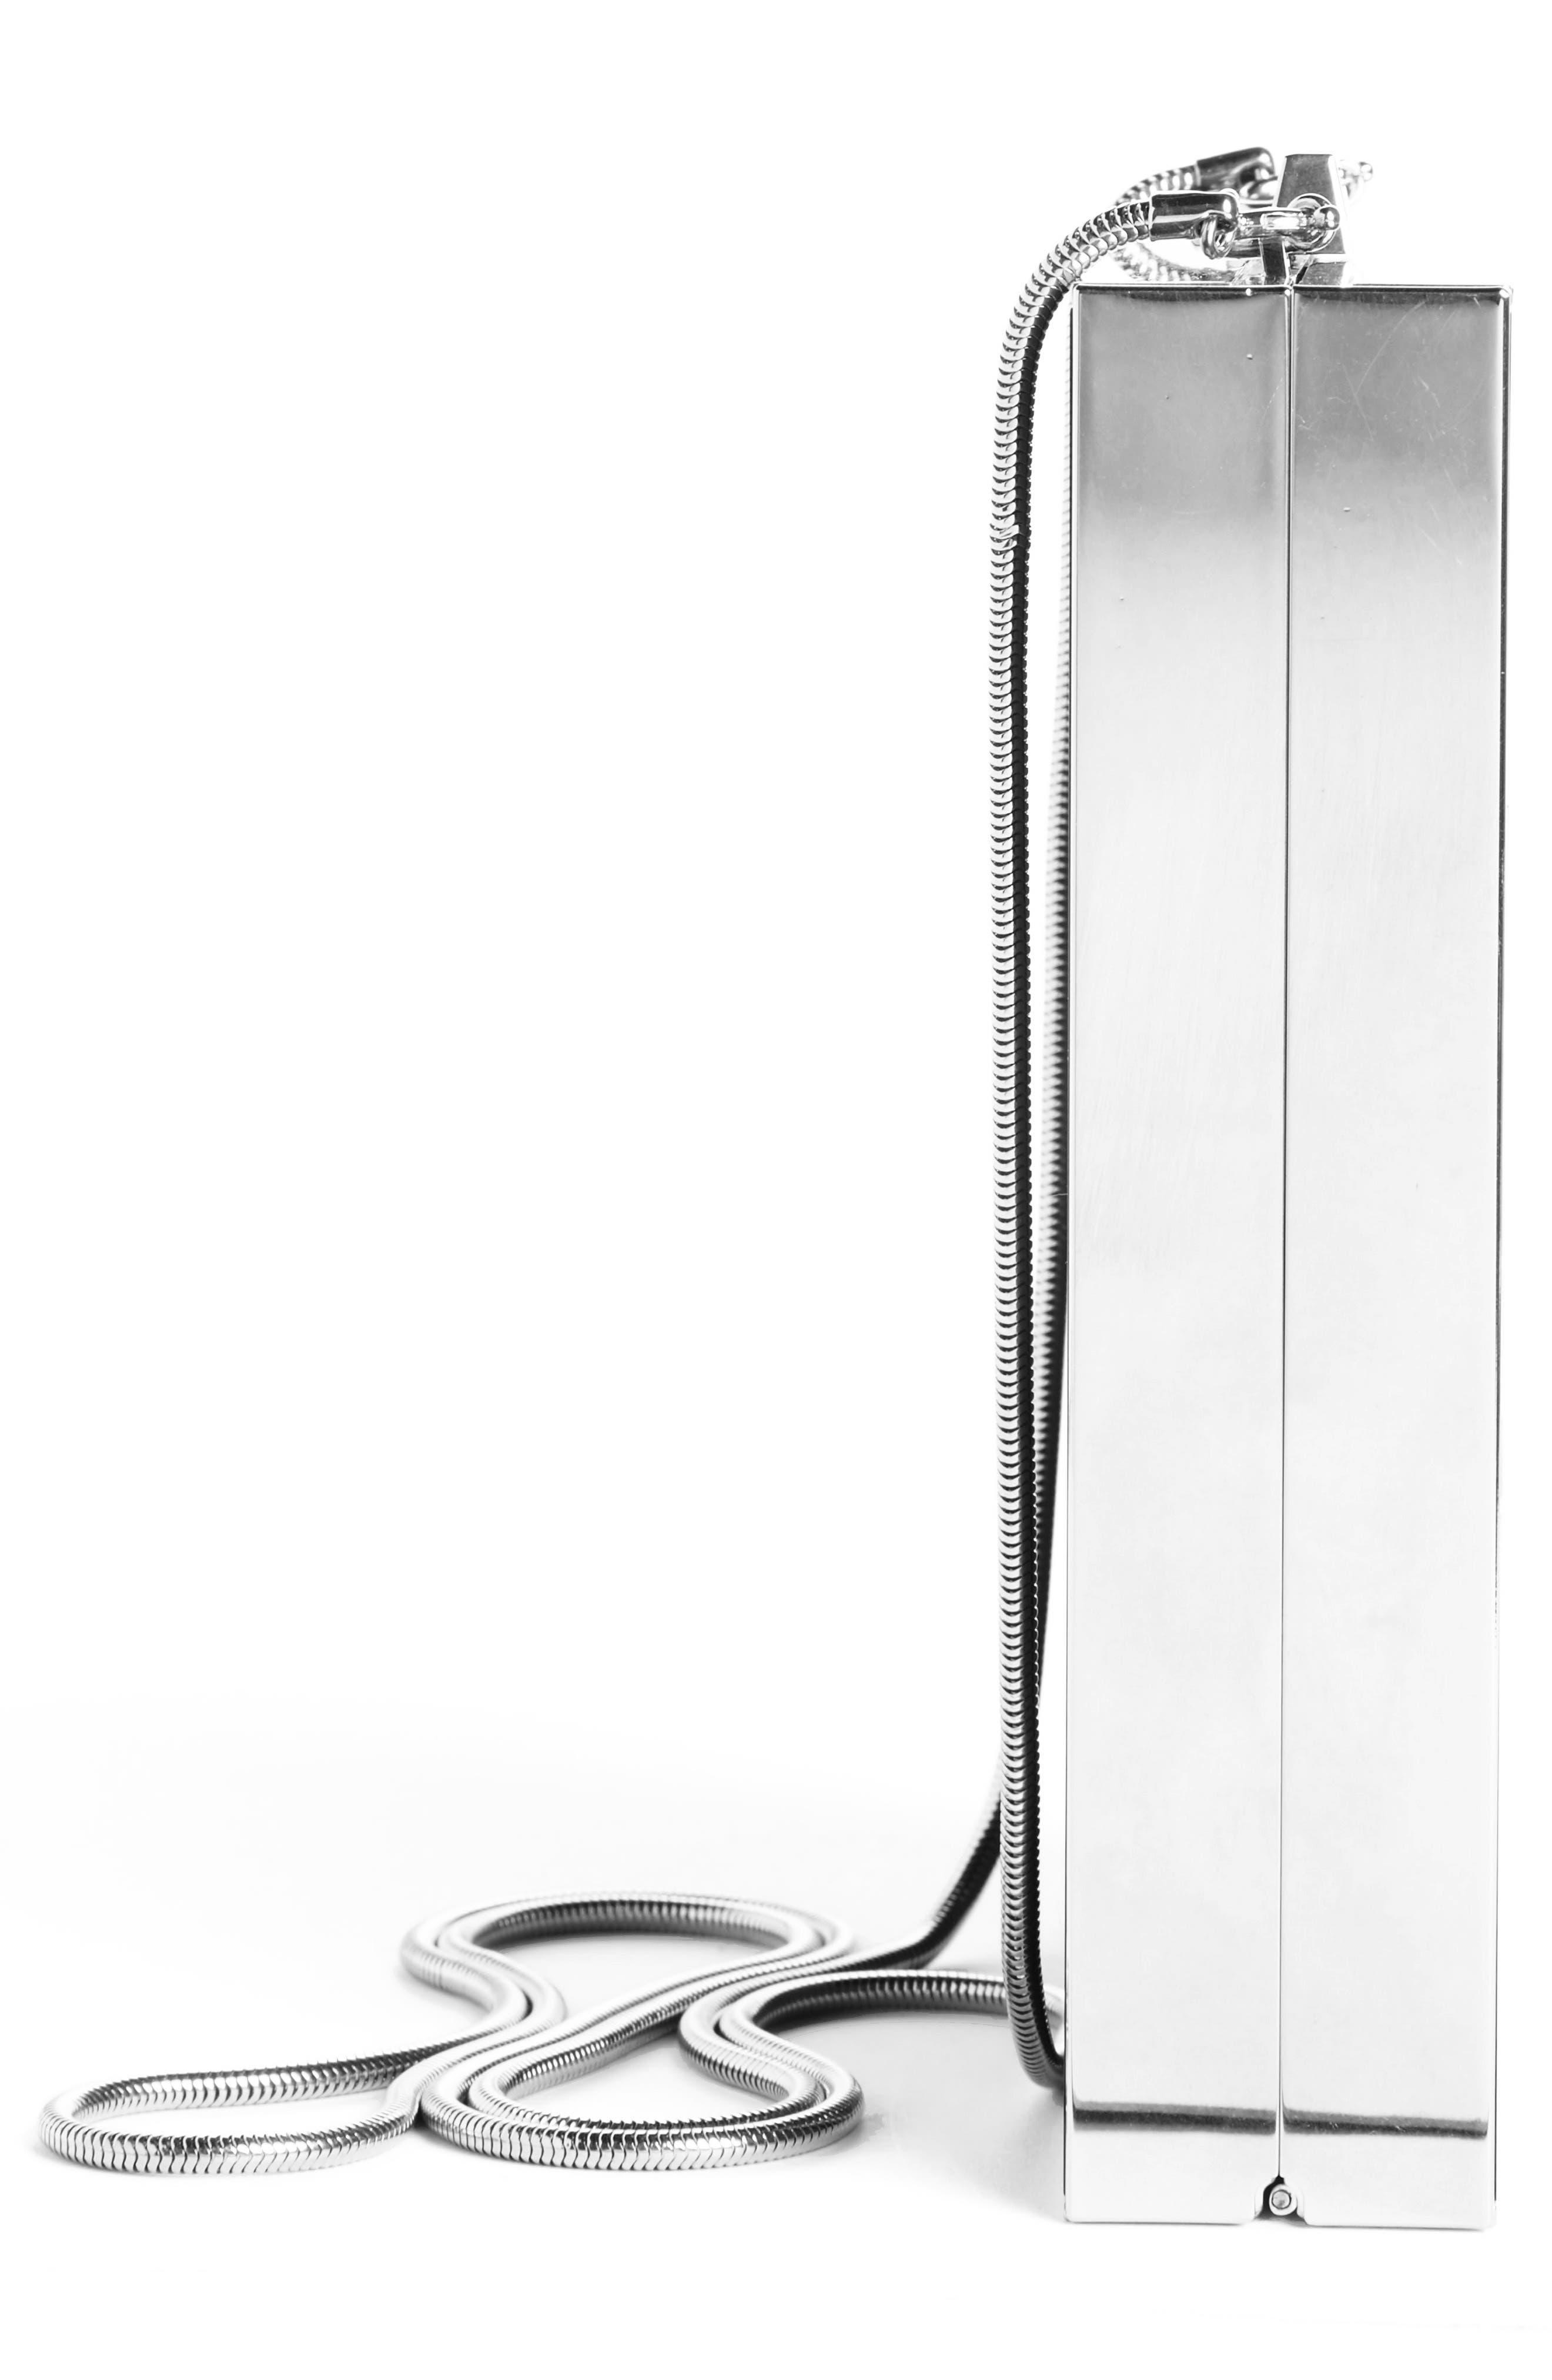 Tuxedo Plexiglass Clutch,                             Alternate thumbnail 3, color,                             Noir/ Silver